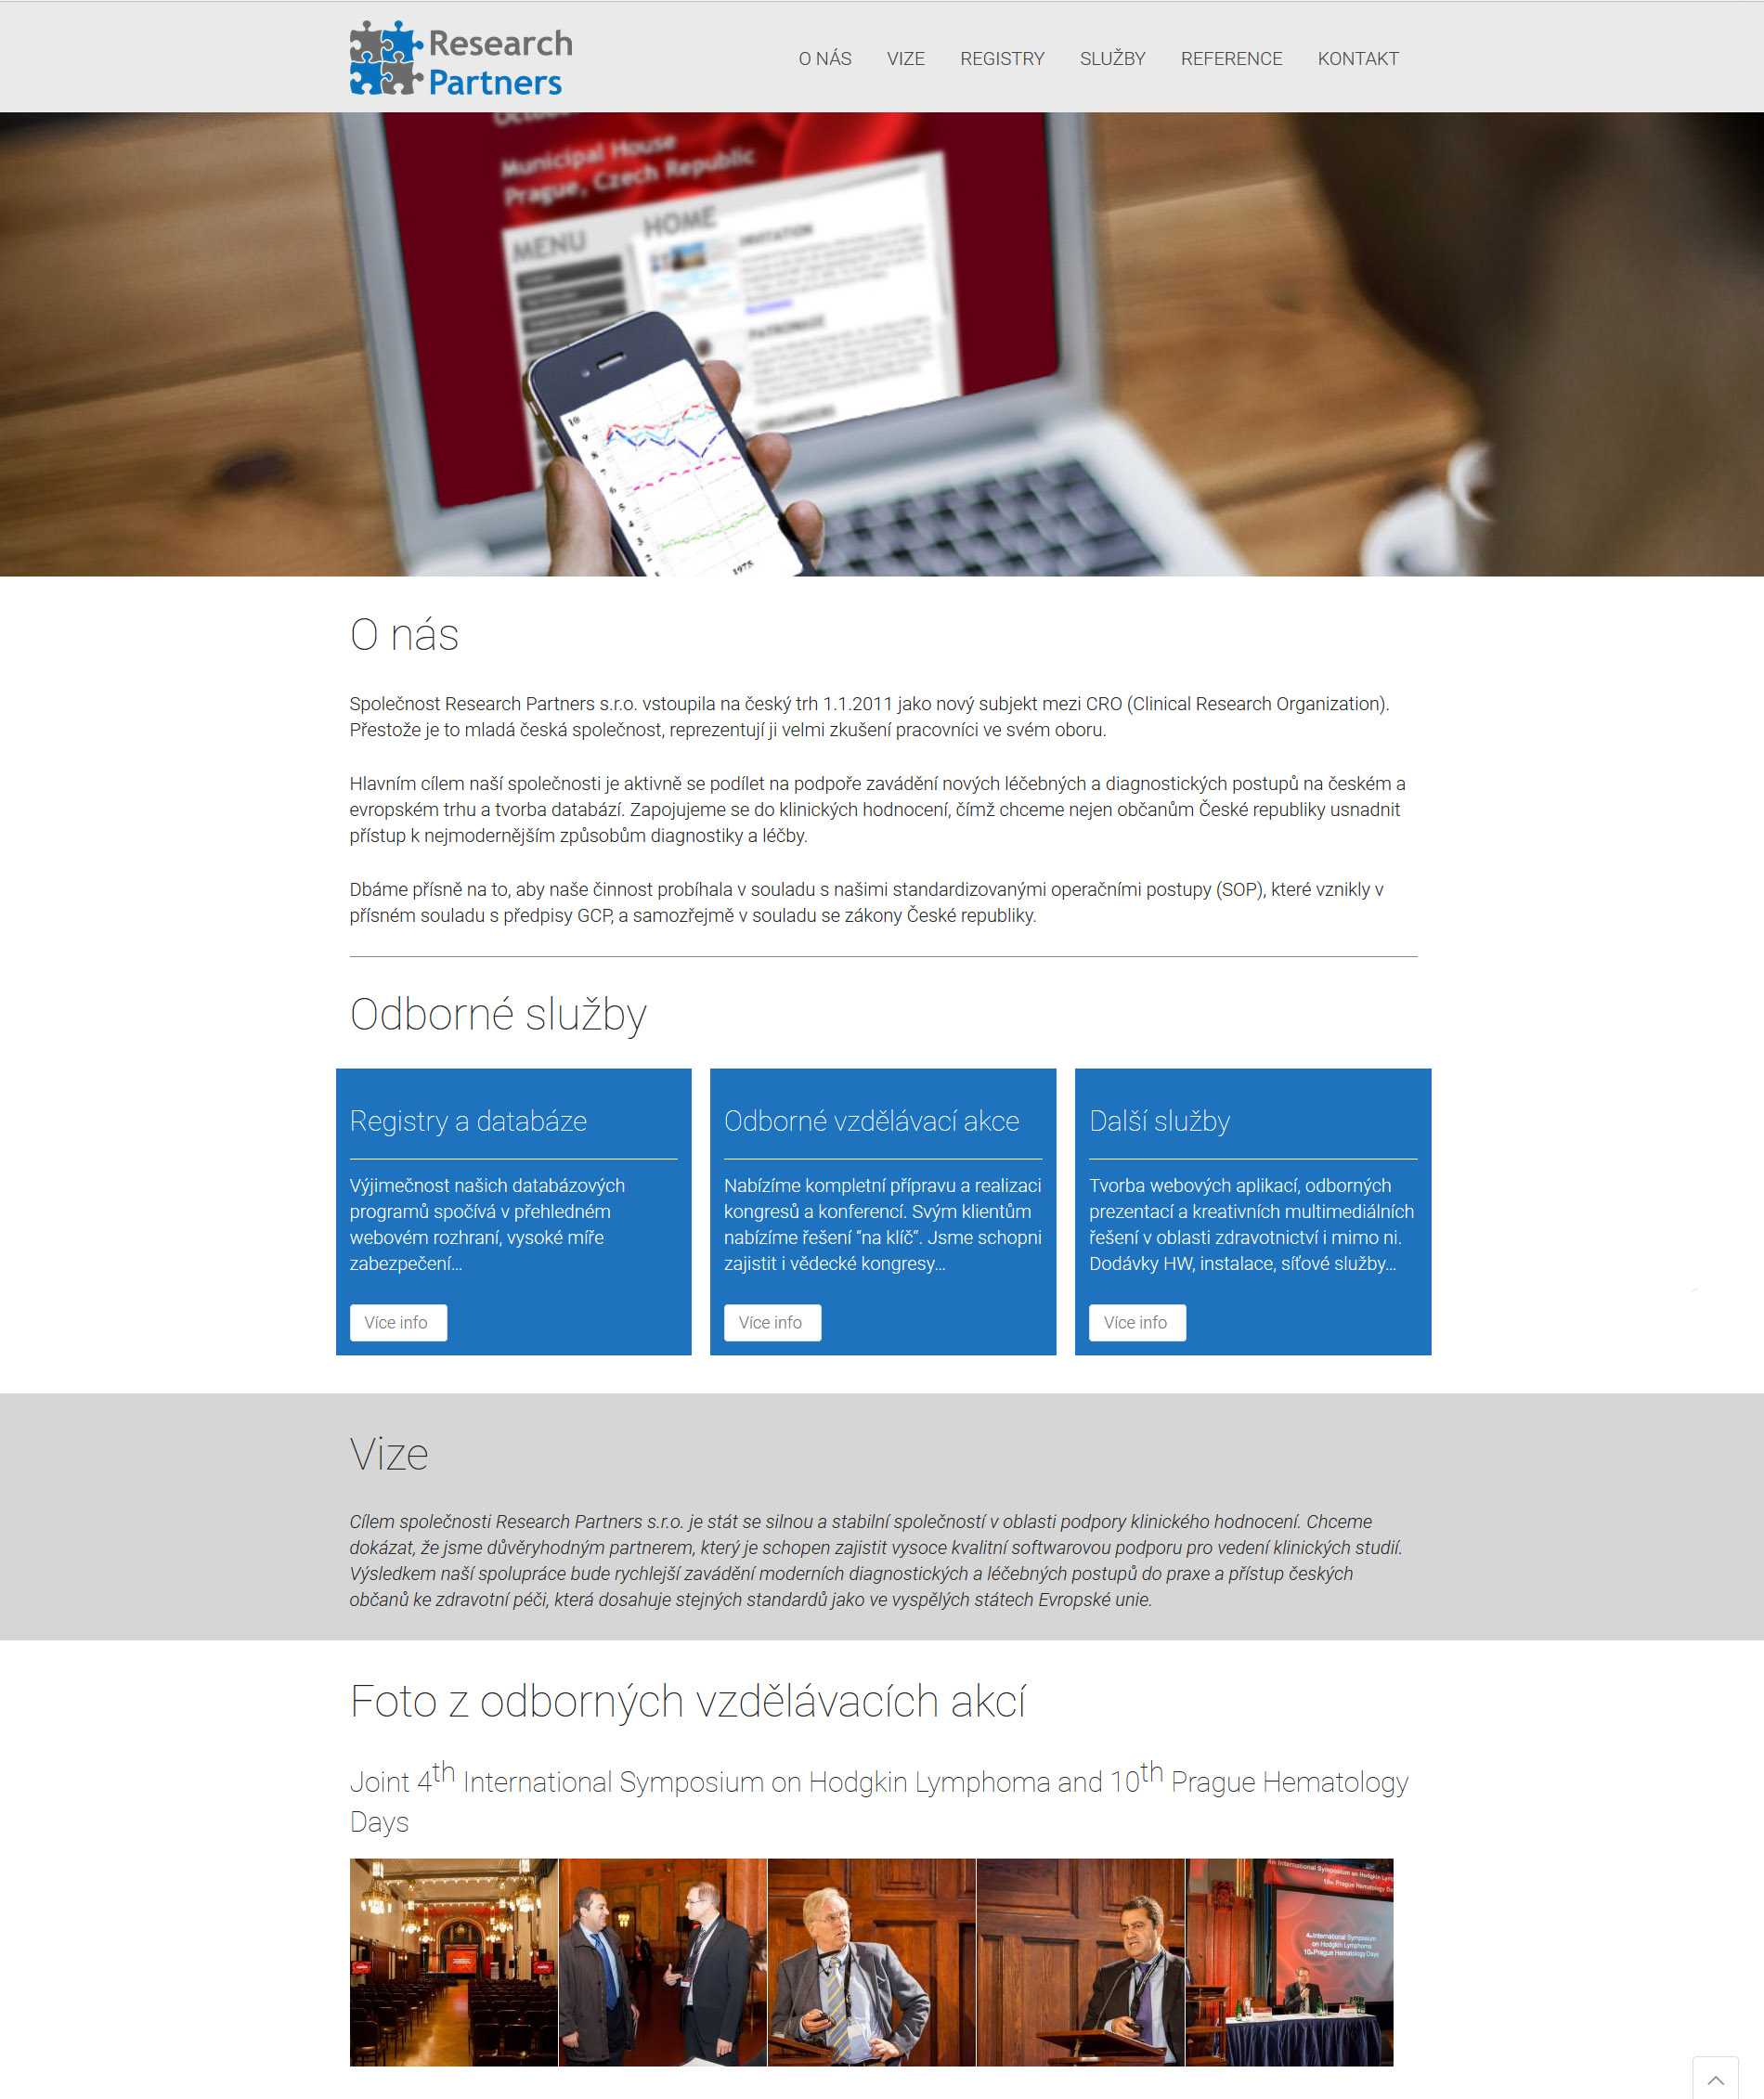 Tvorba webu - reference